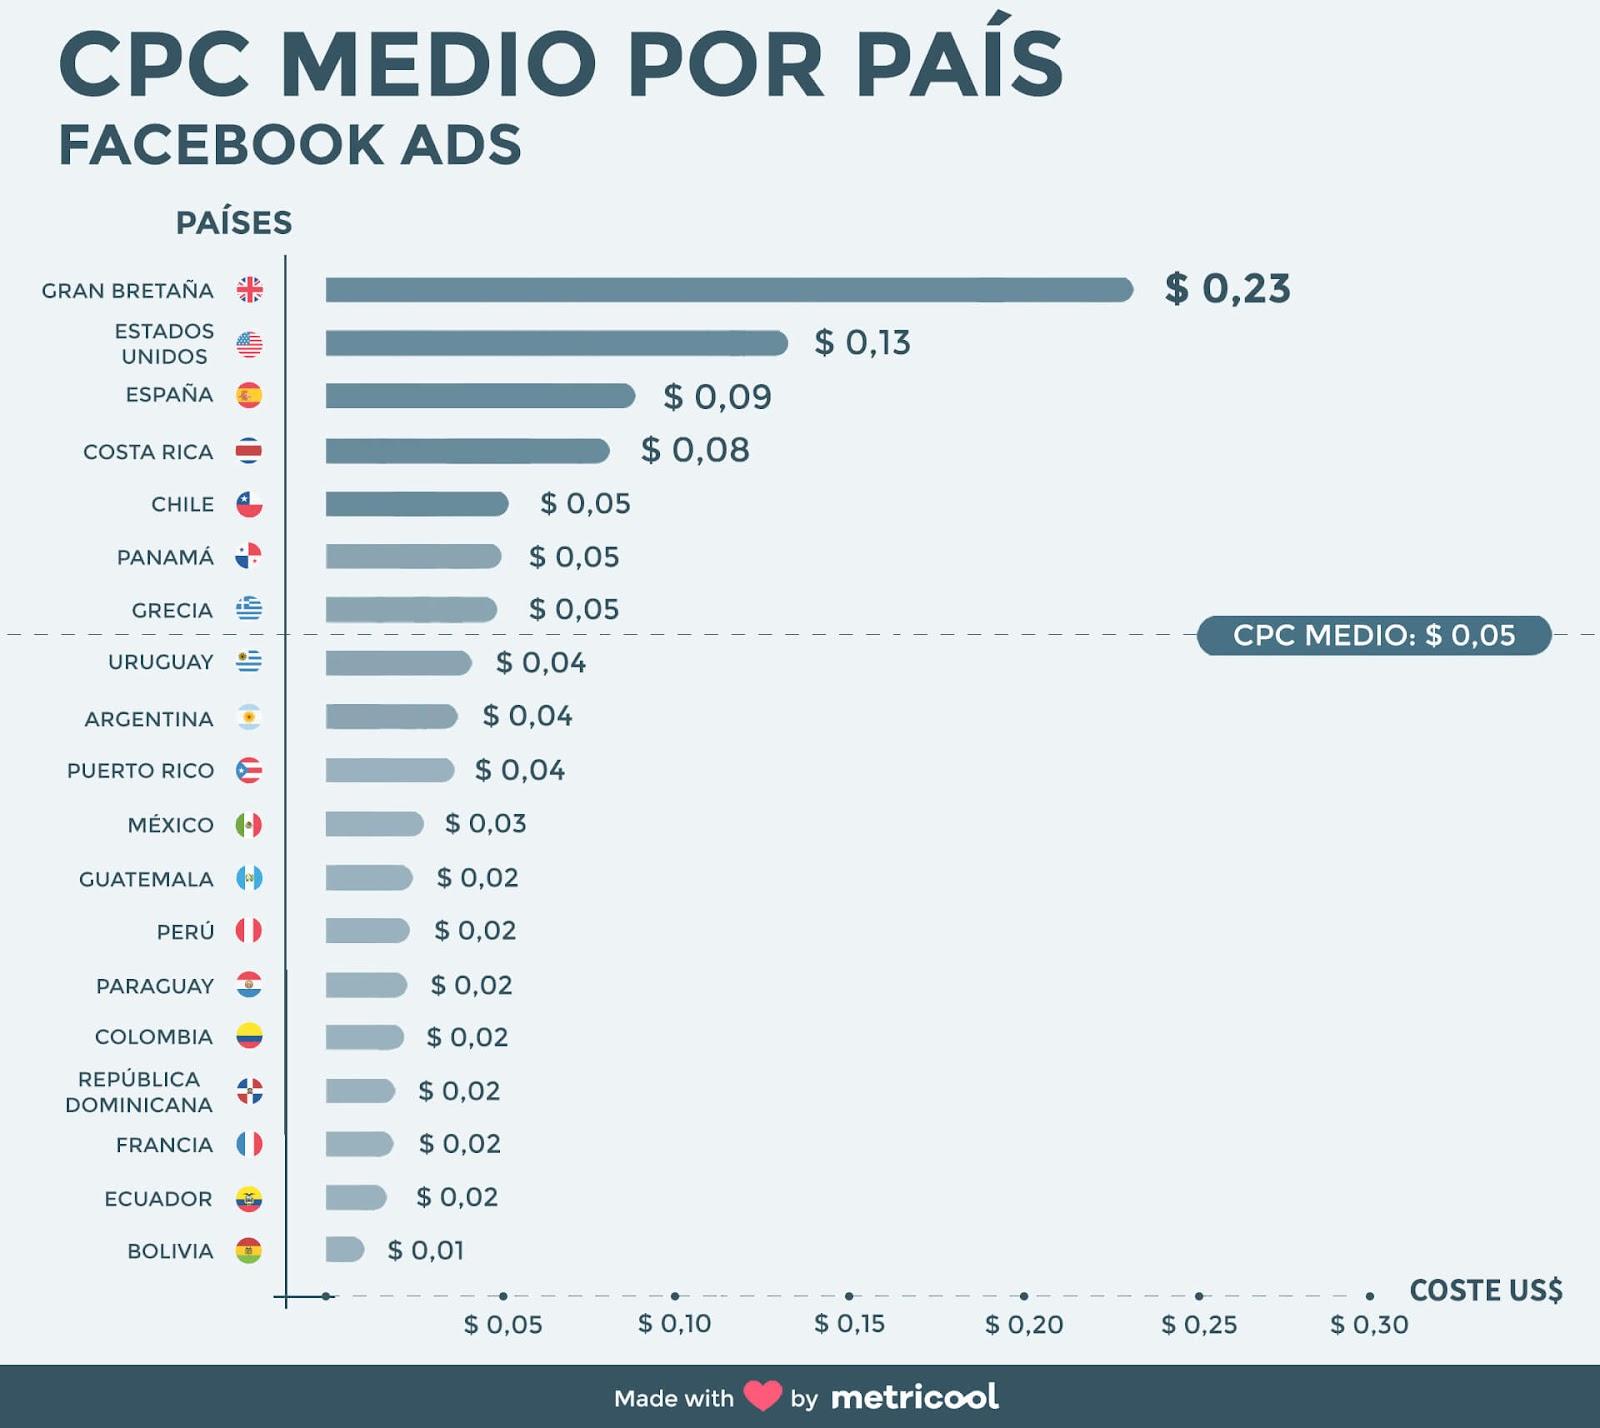 CPC medio por pais metricool